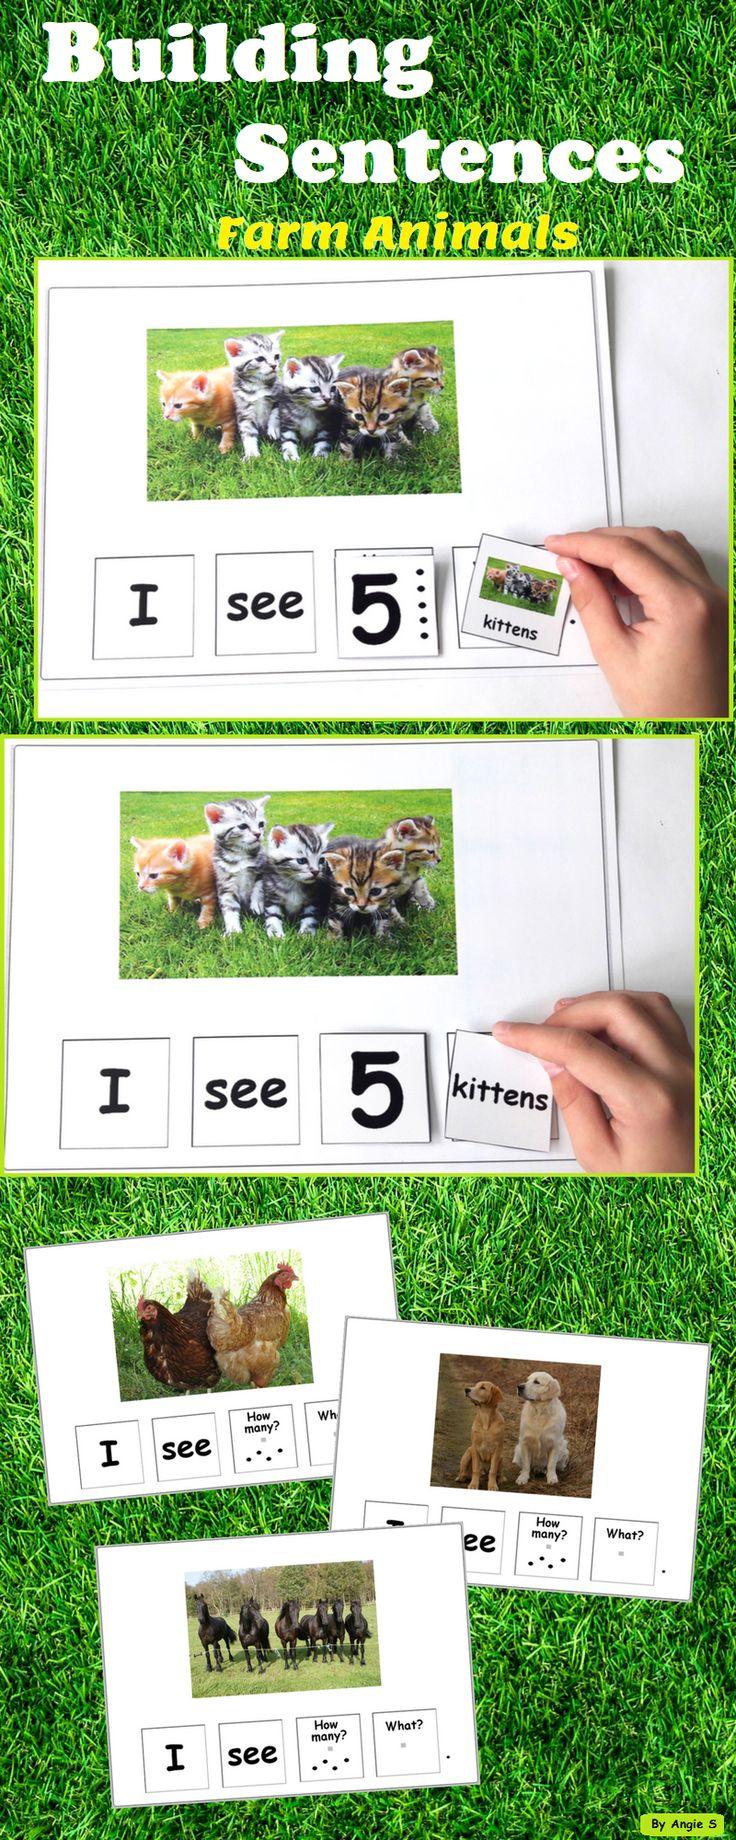 Farm Animals Activity – Building Sentences